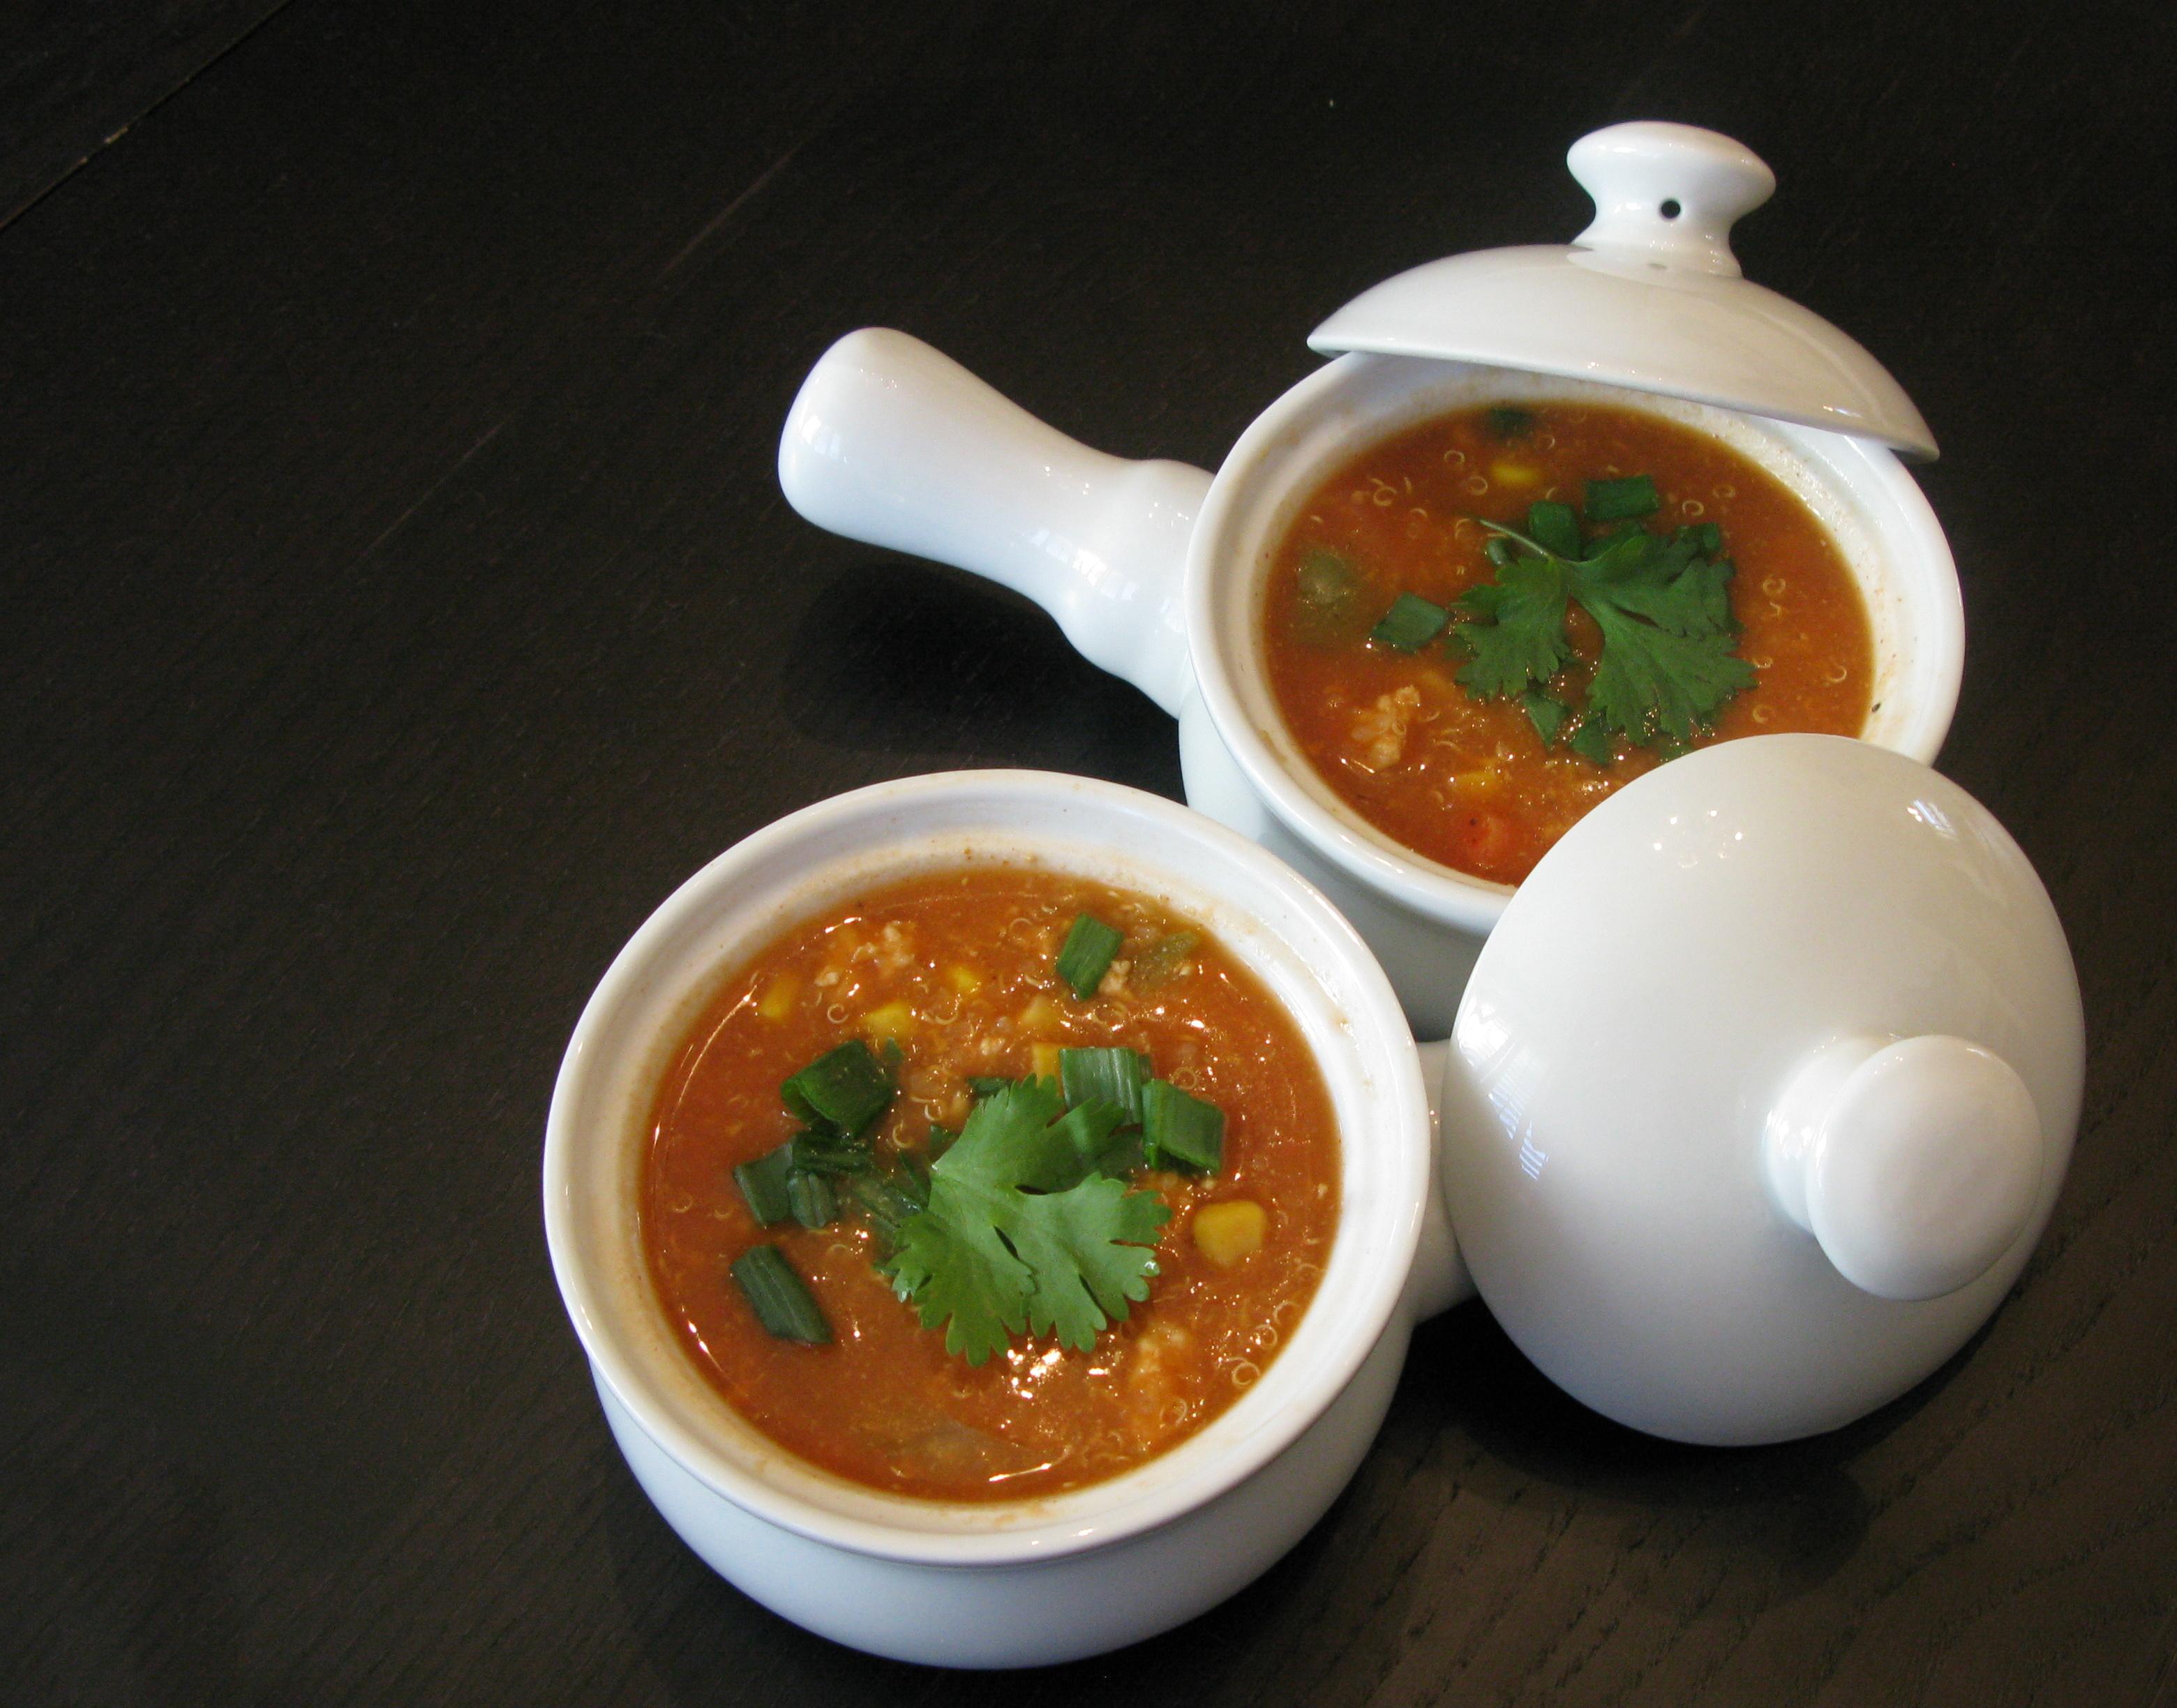 Spicy Tomato Vegetable Quinoa Soup | DeshiGrub.com